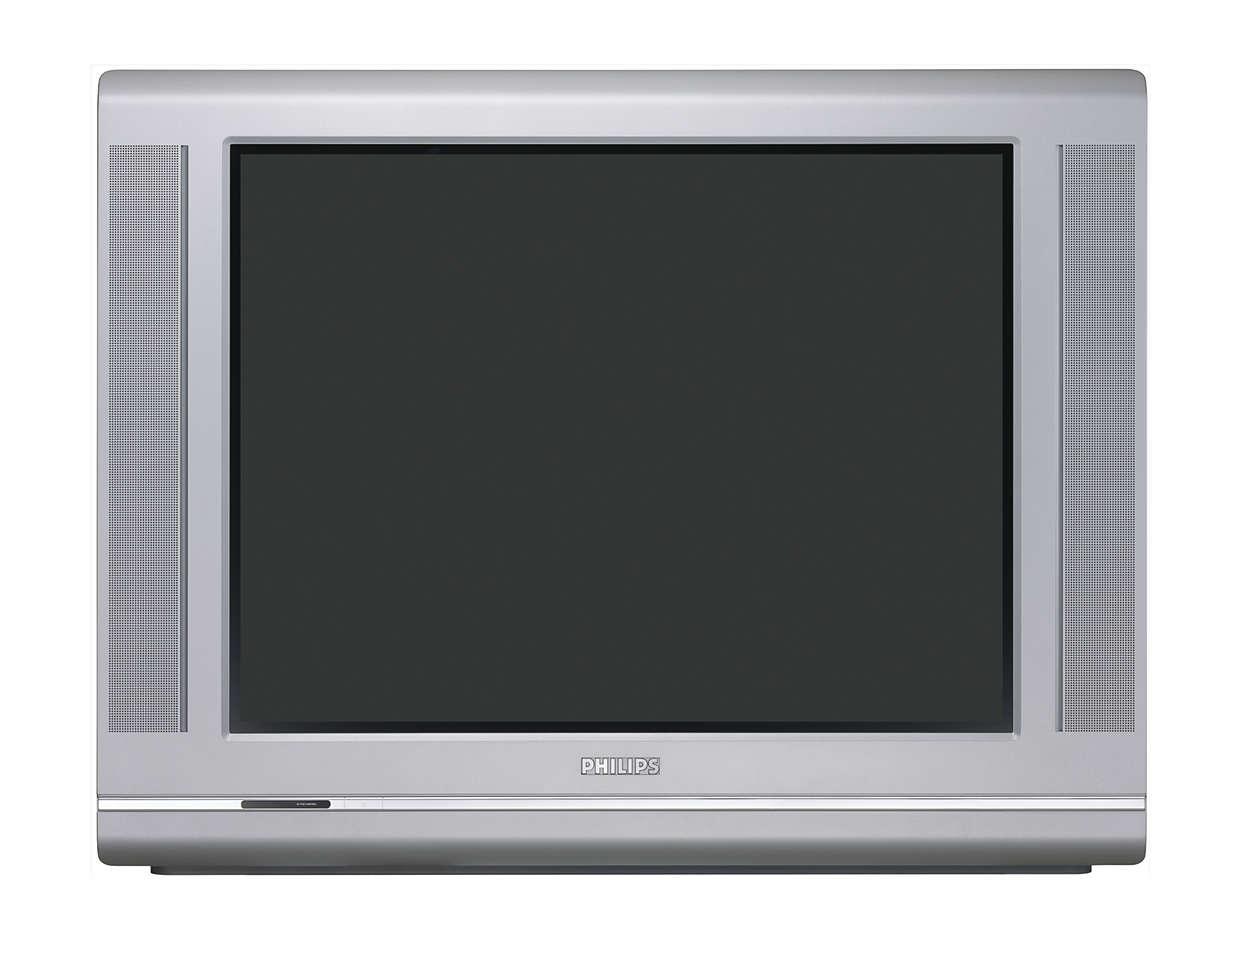 Страница 48/65] инструкция: телевизор philips cineos 42pf9631d.